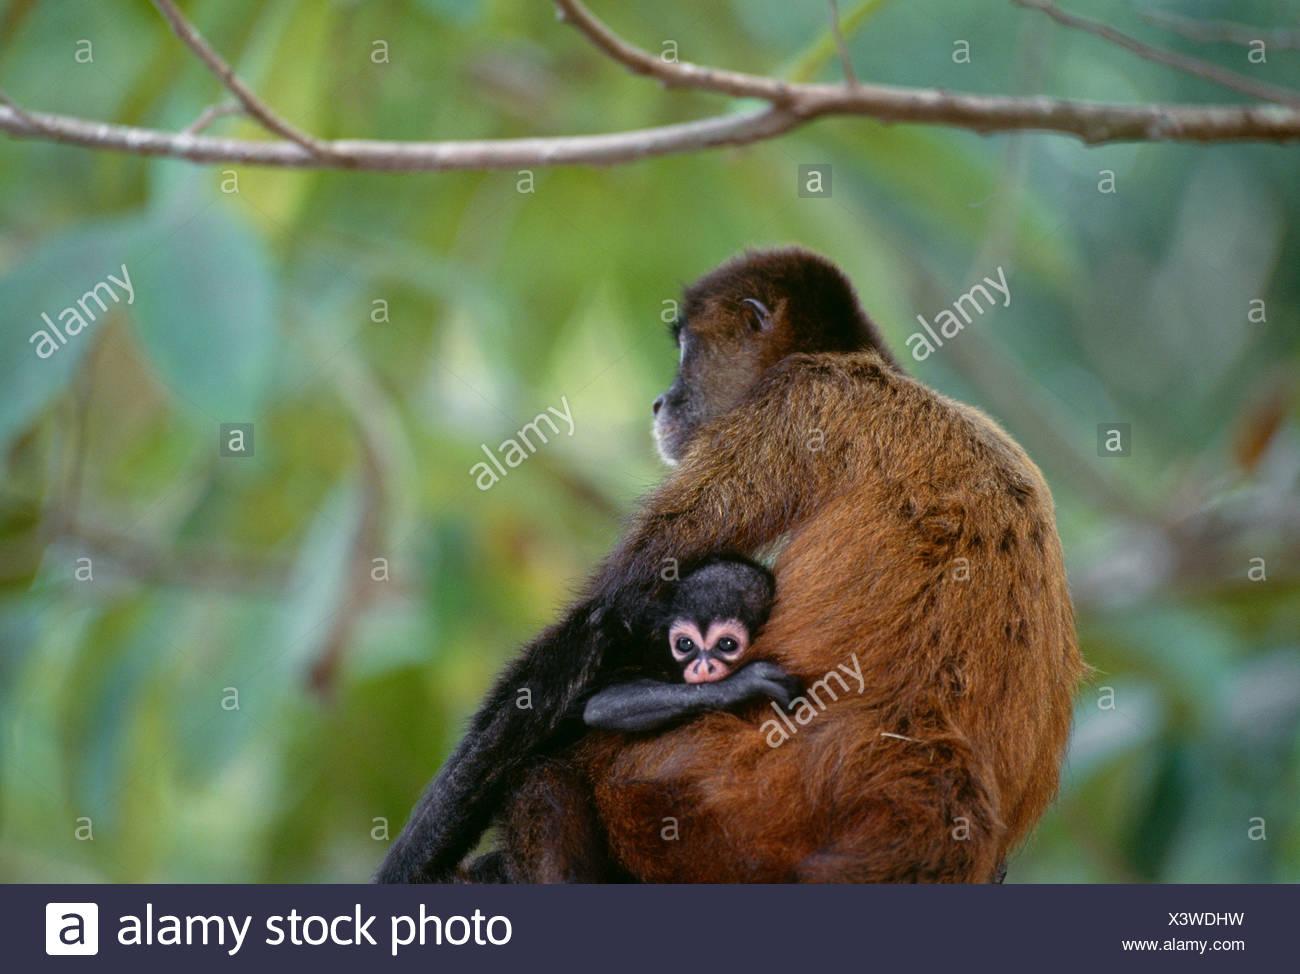 Black-handed spider monkey and infant, Panama - Stock Image